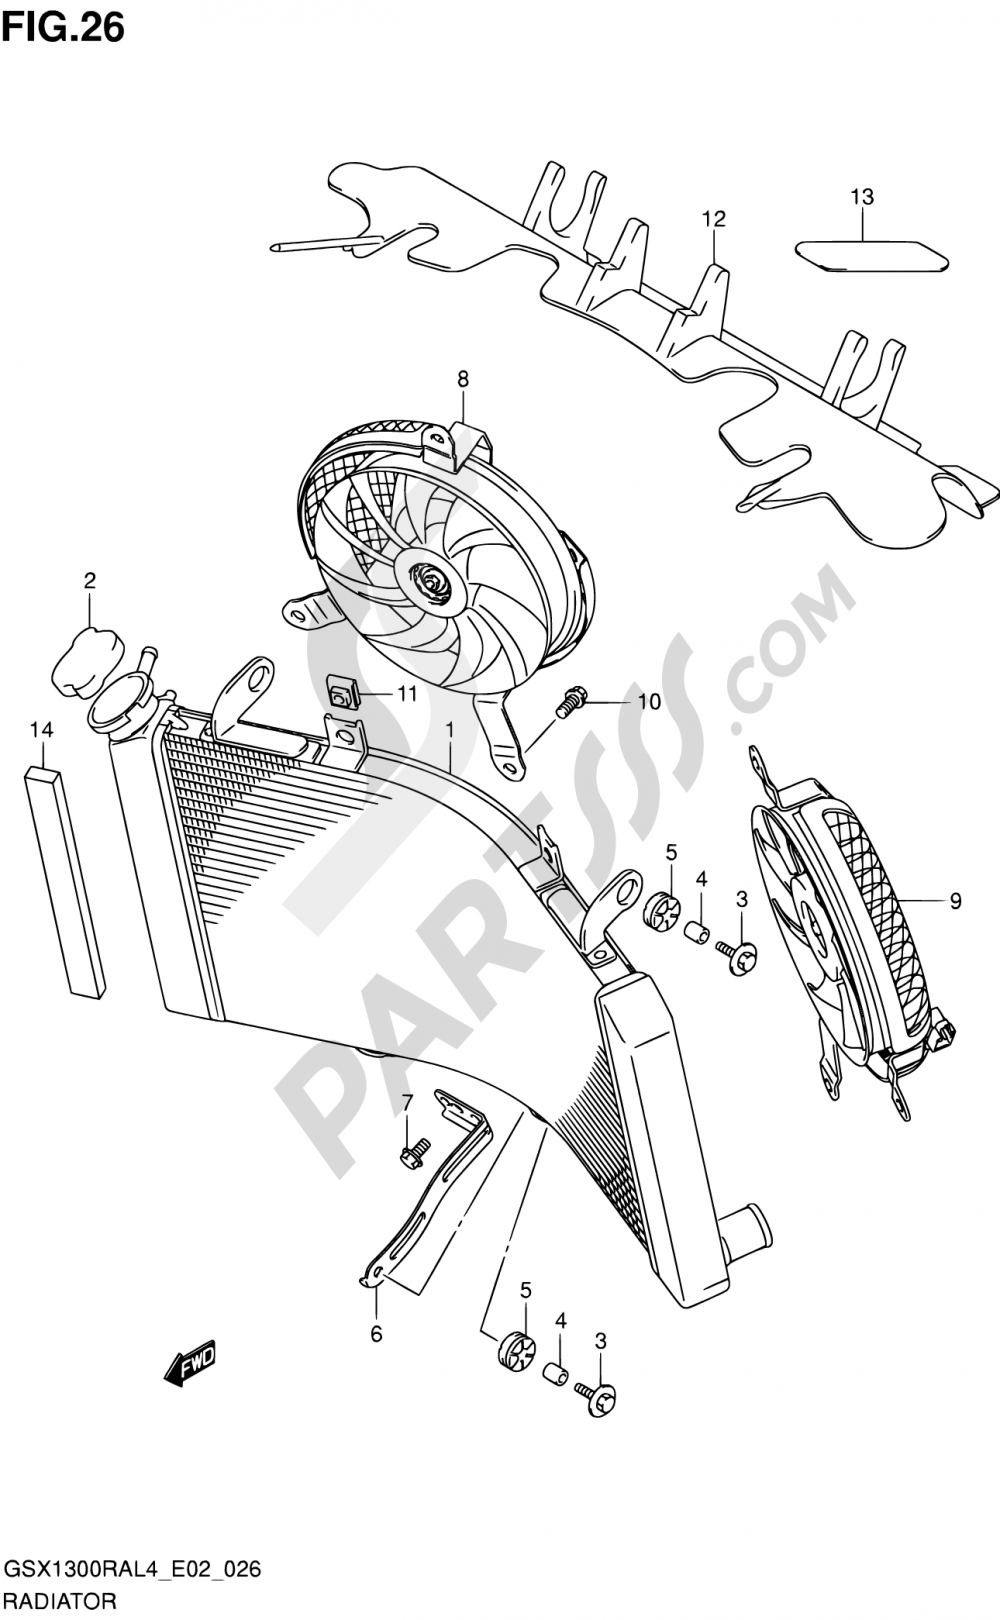 26 - RADIATOR (GSX1300RAUFL4 E19) Suzuki HAYABUSA GSX1300RA 2014